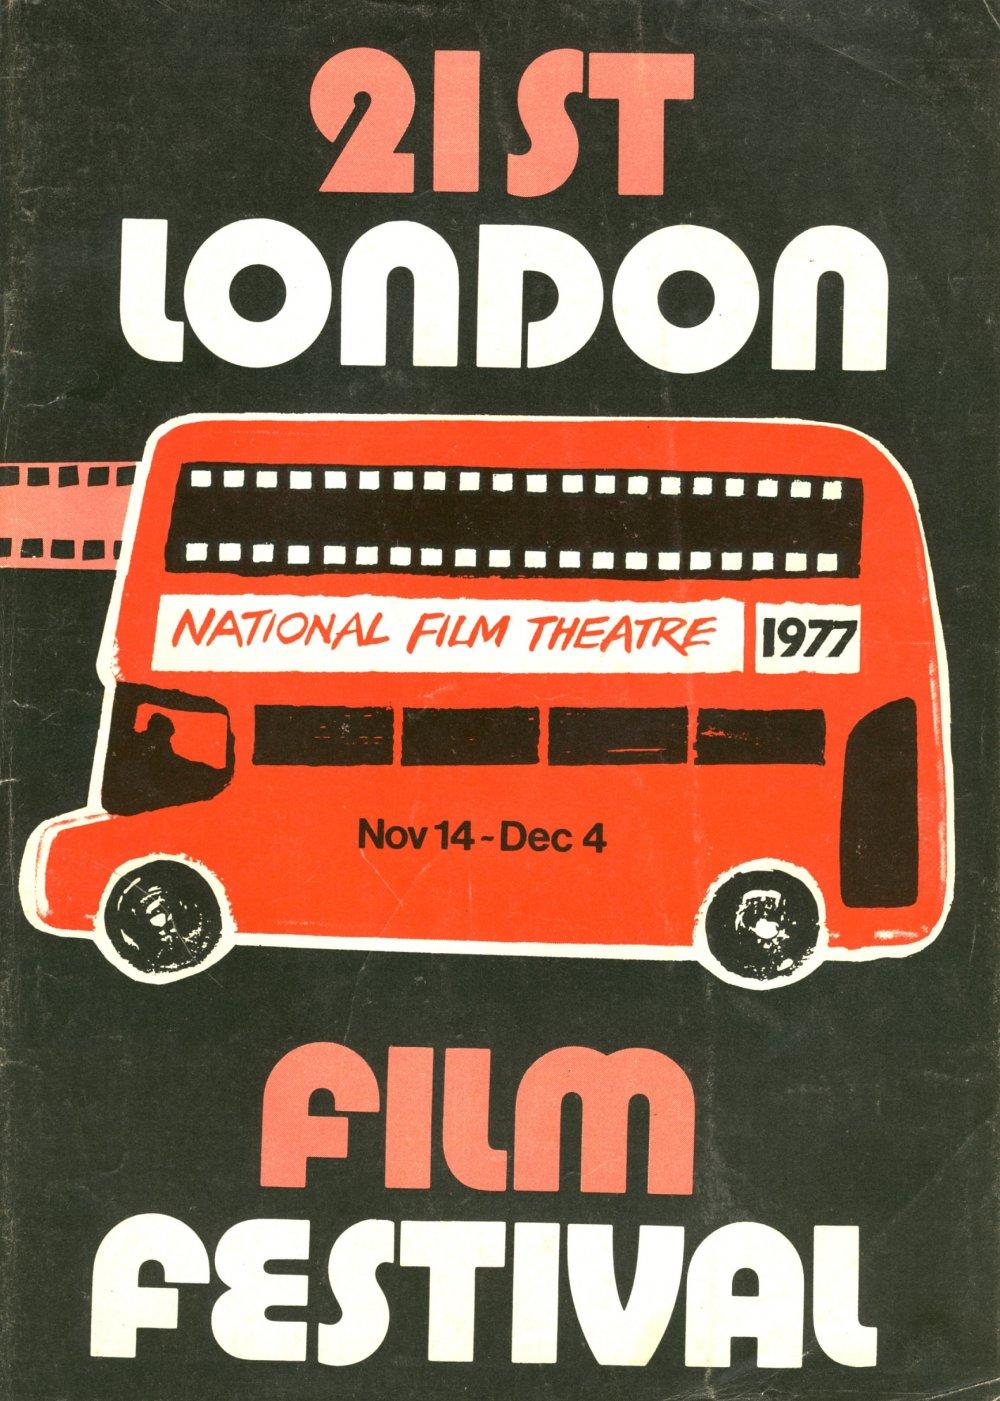 LFF brochure 1977